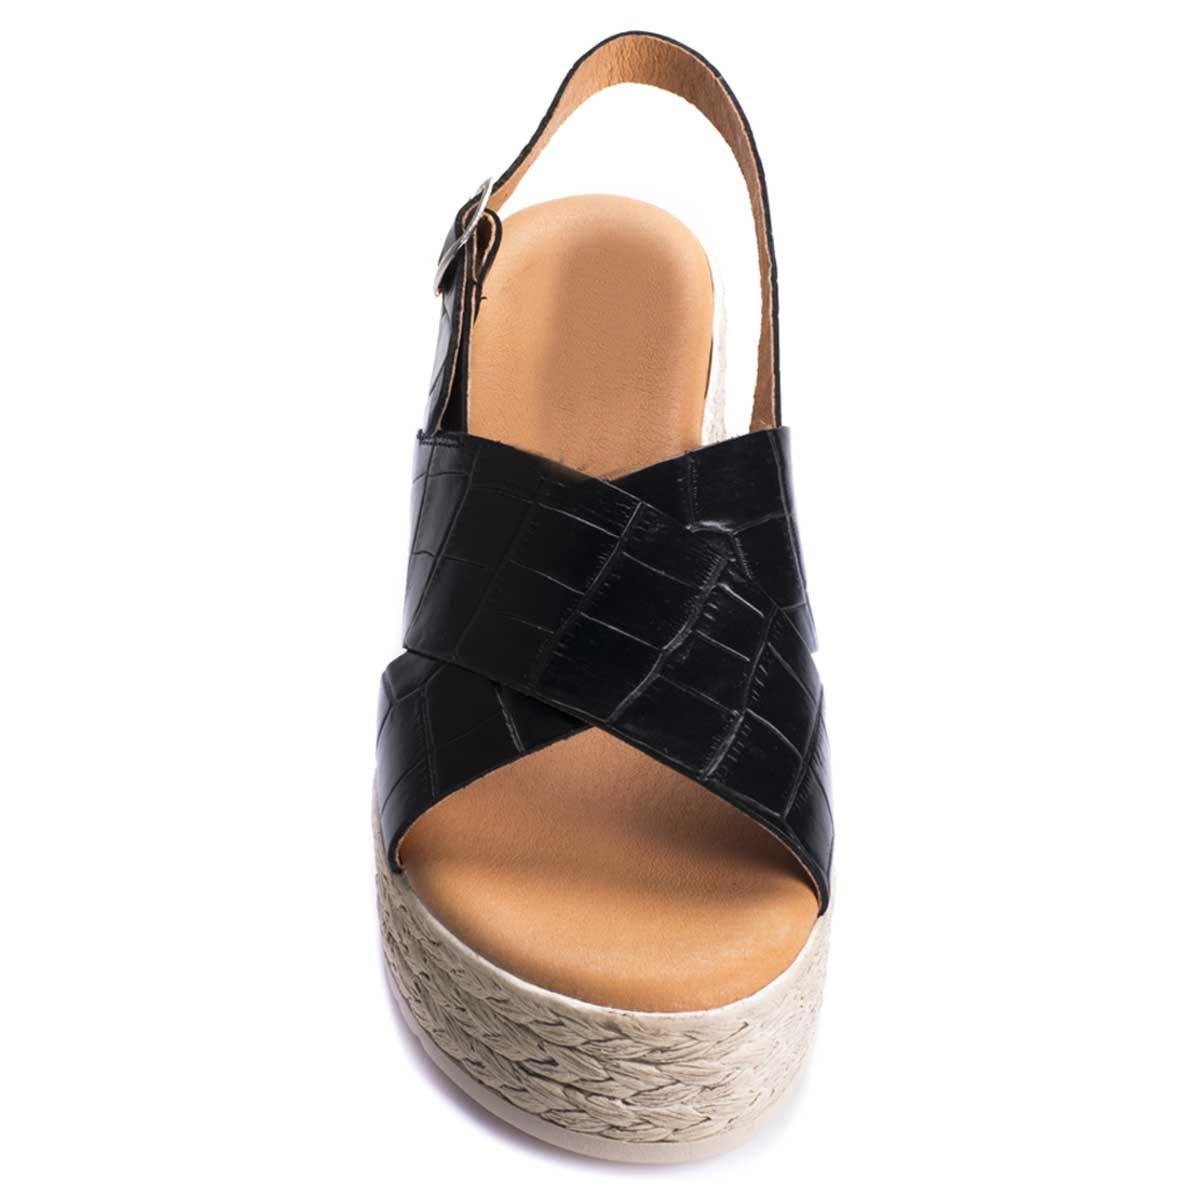 Purapiel Platform Sandal in Black